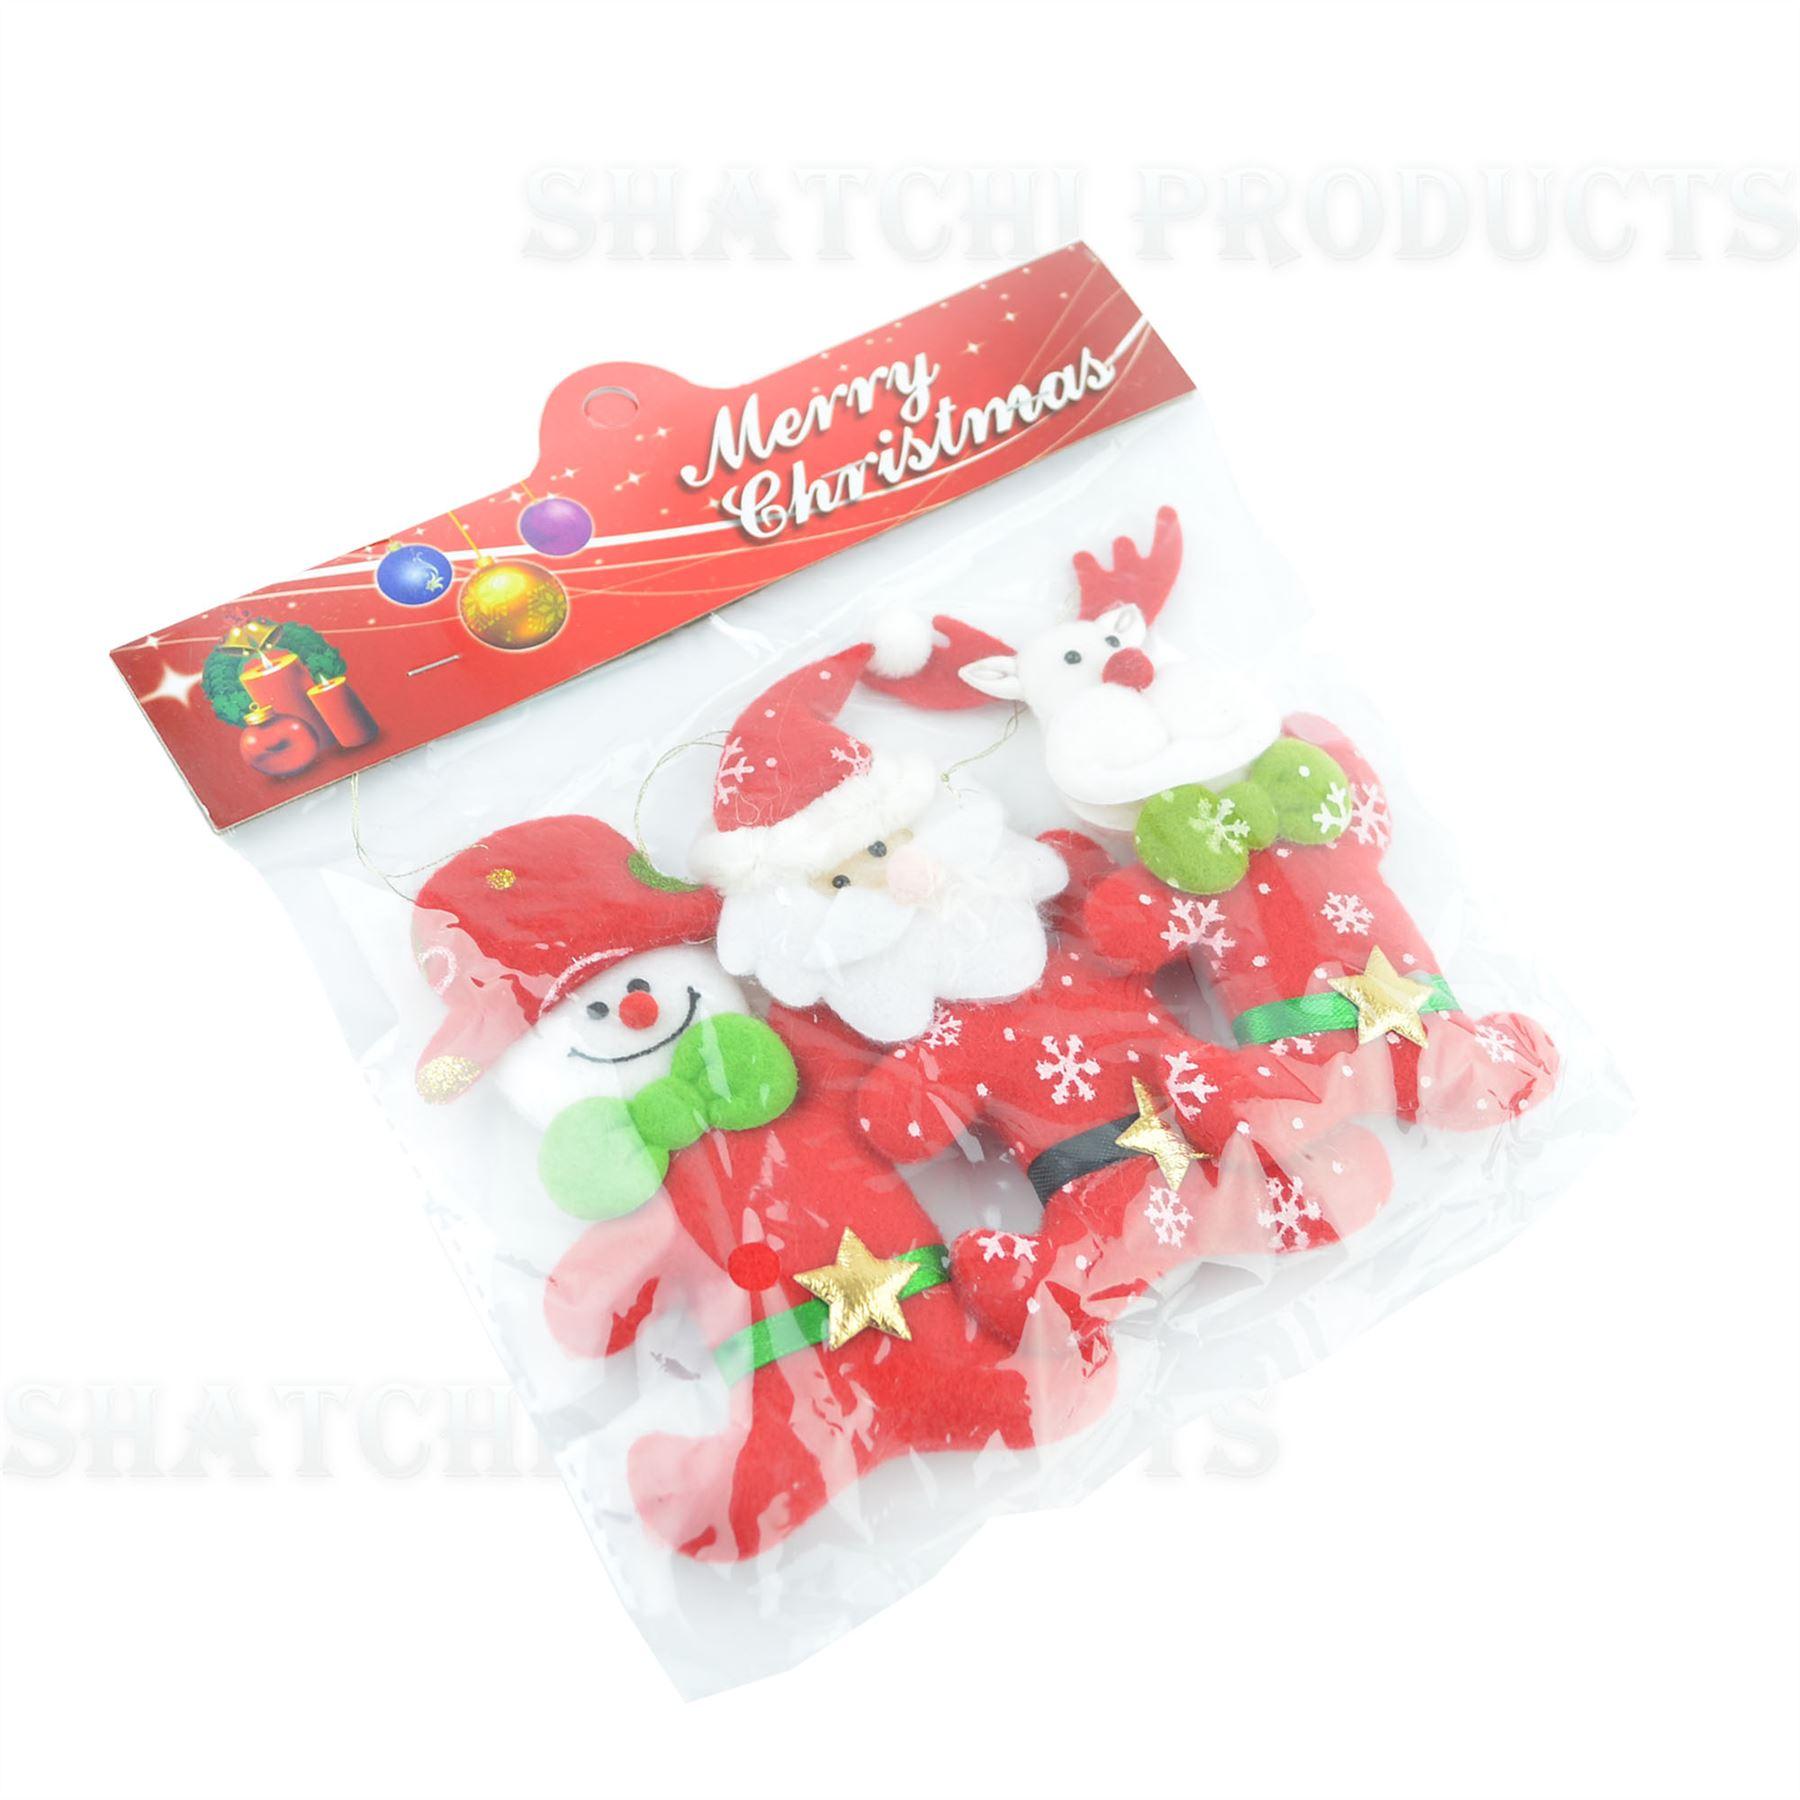 Christmas-Tree-Hanging-Decorations-Glitter-Snowman-Xmas-Beads-Chain-Garland thumbnail 22